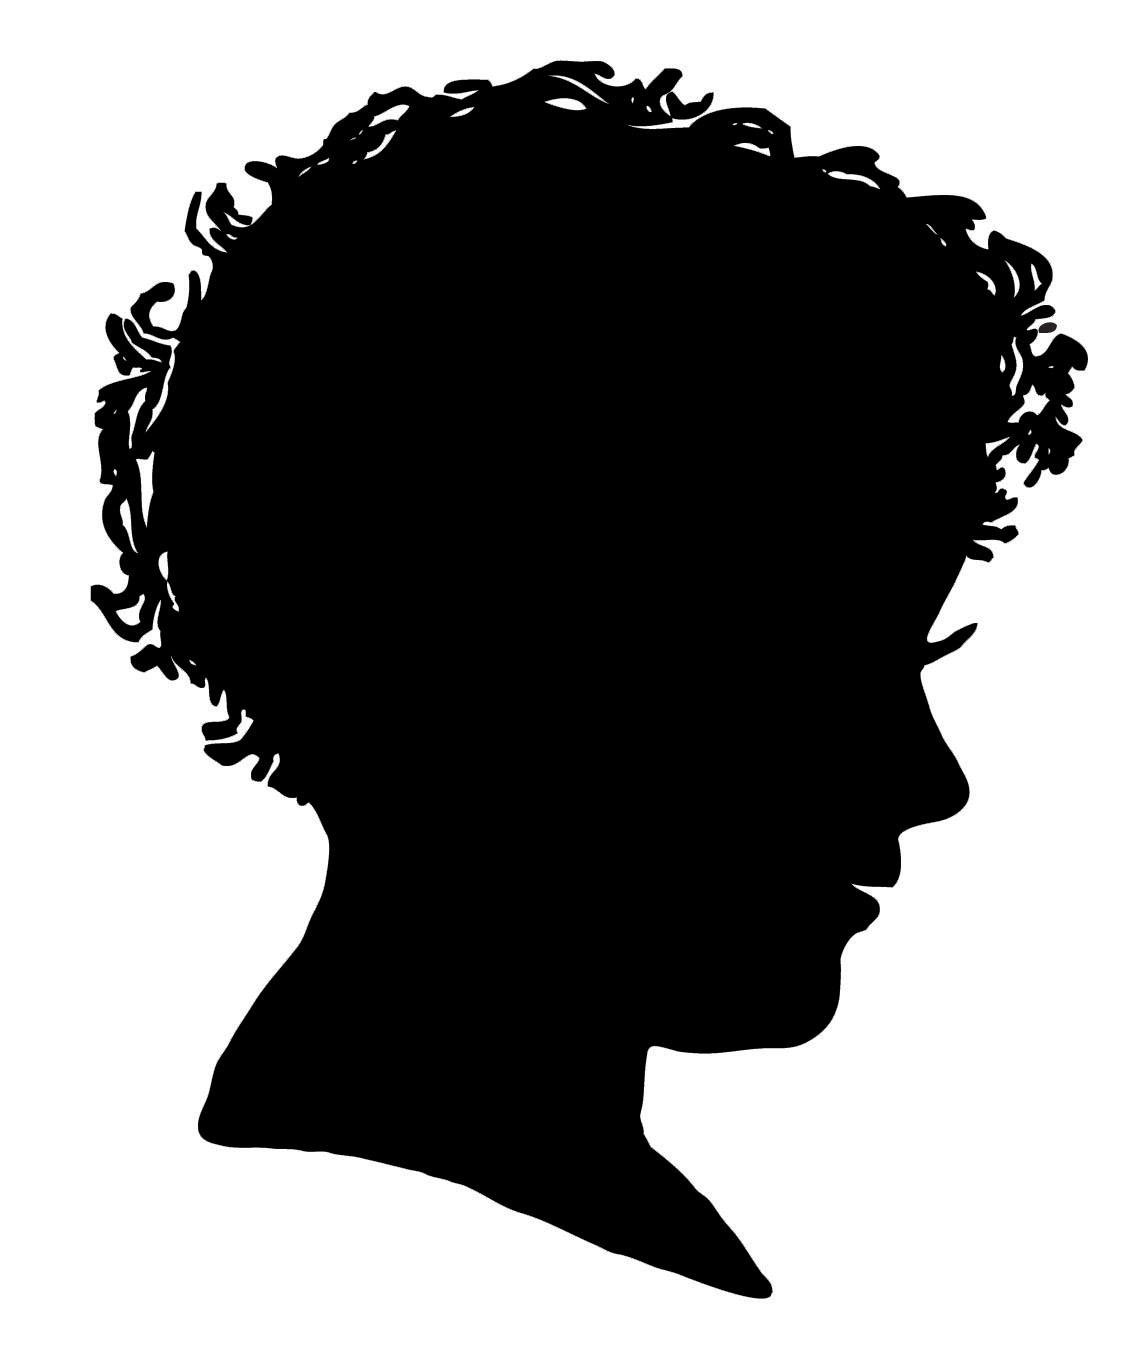 clip art girl silhouette - photo #31